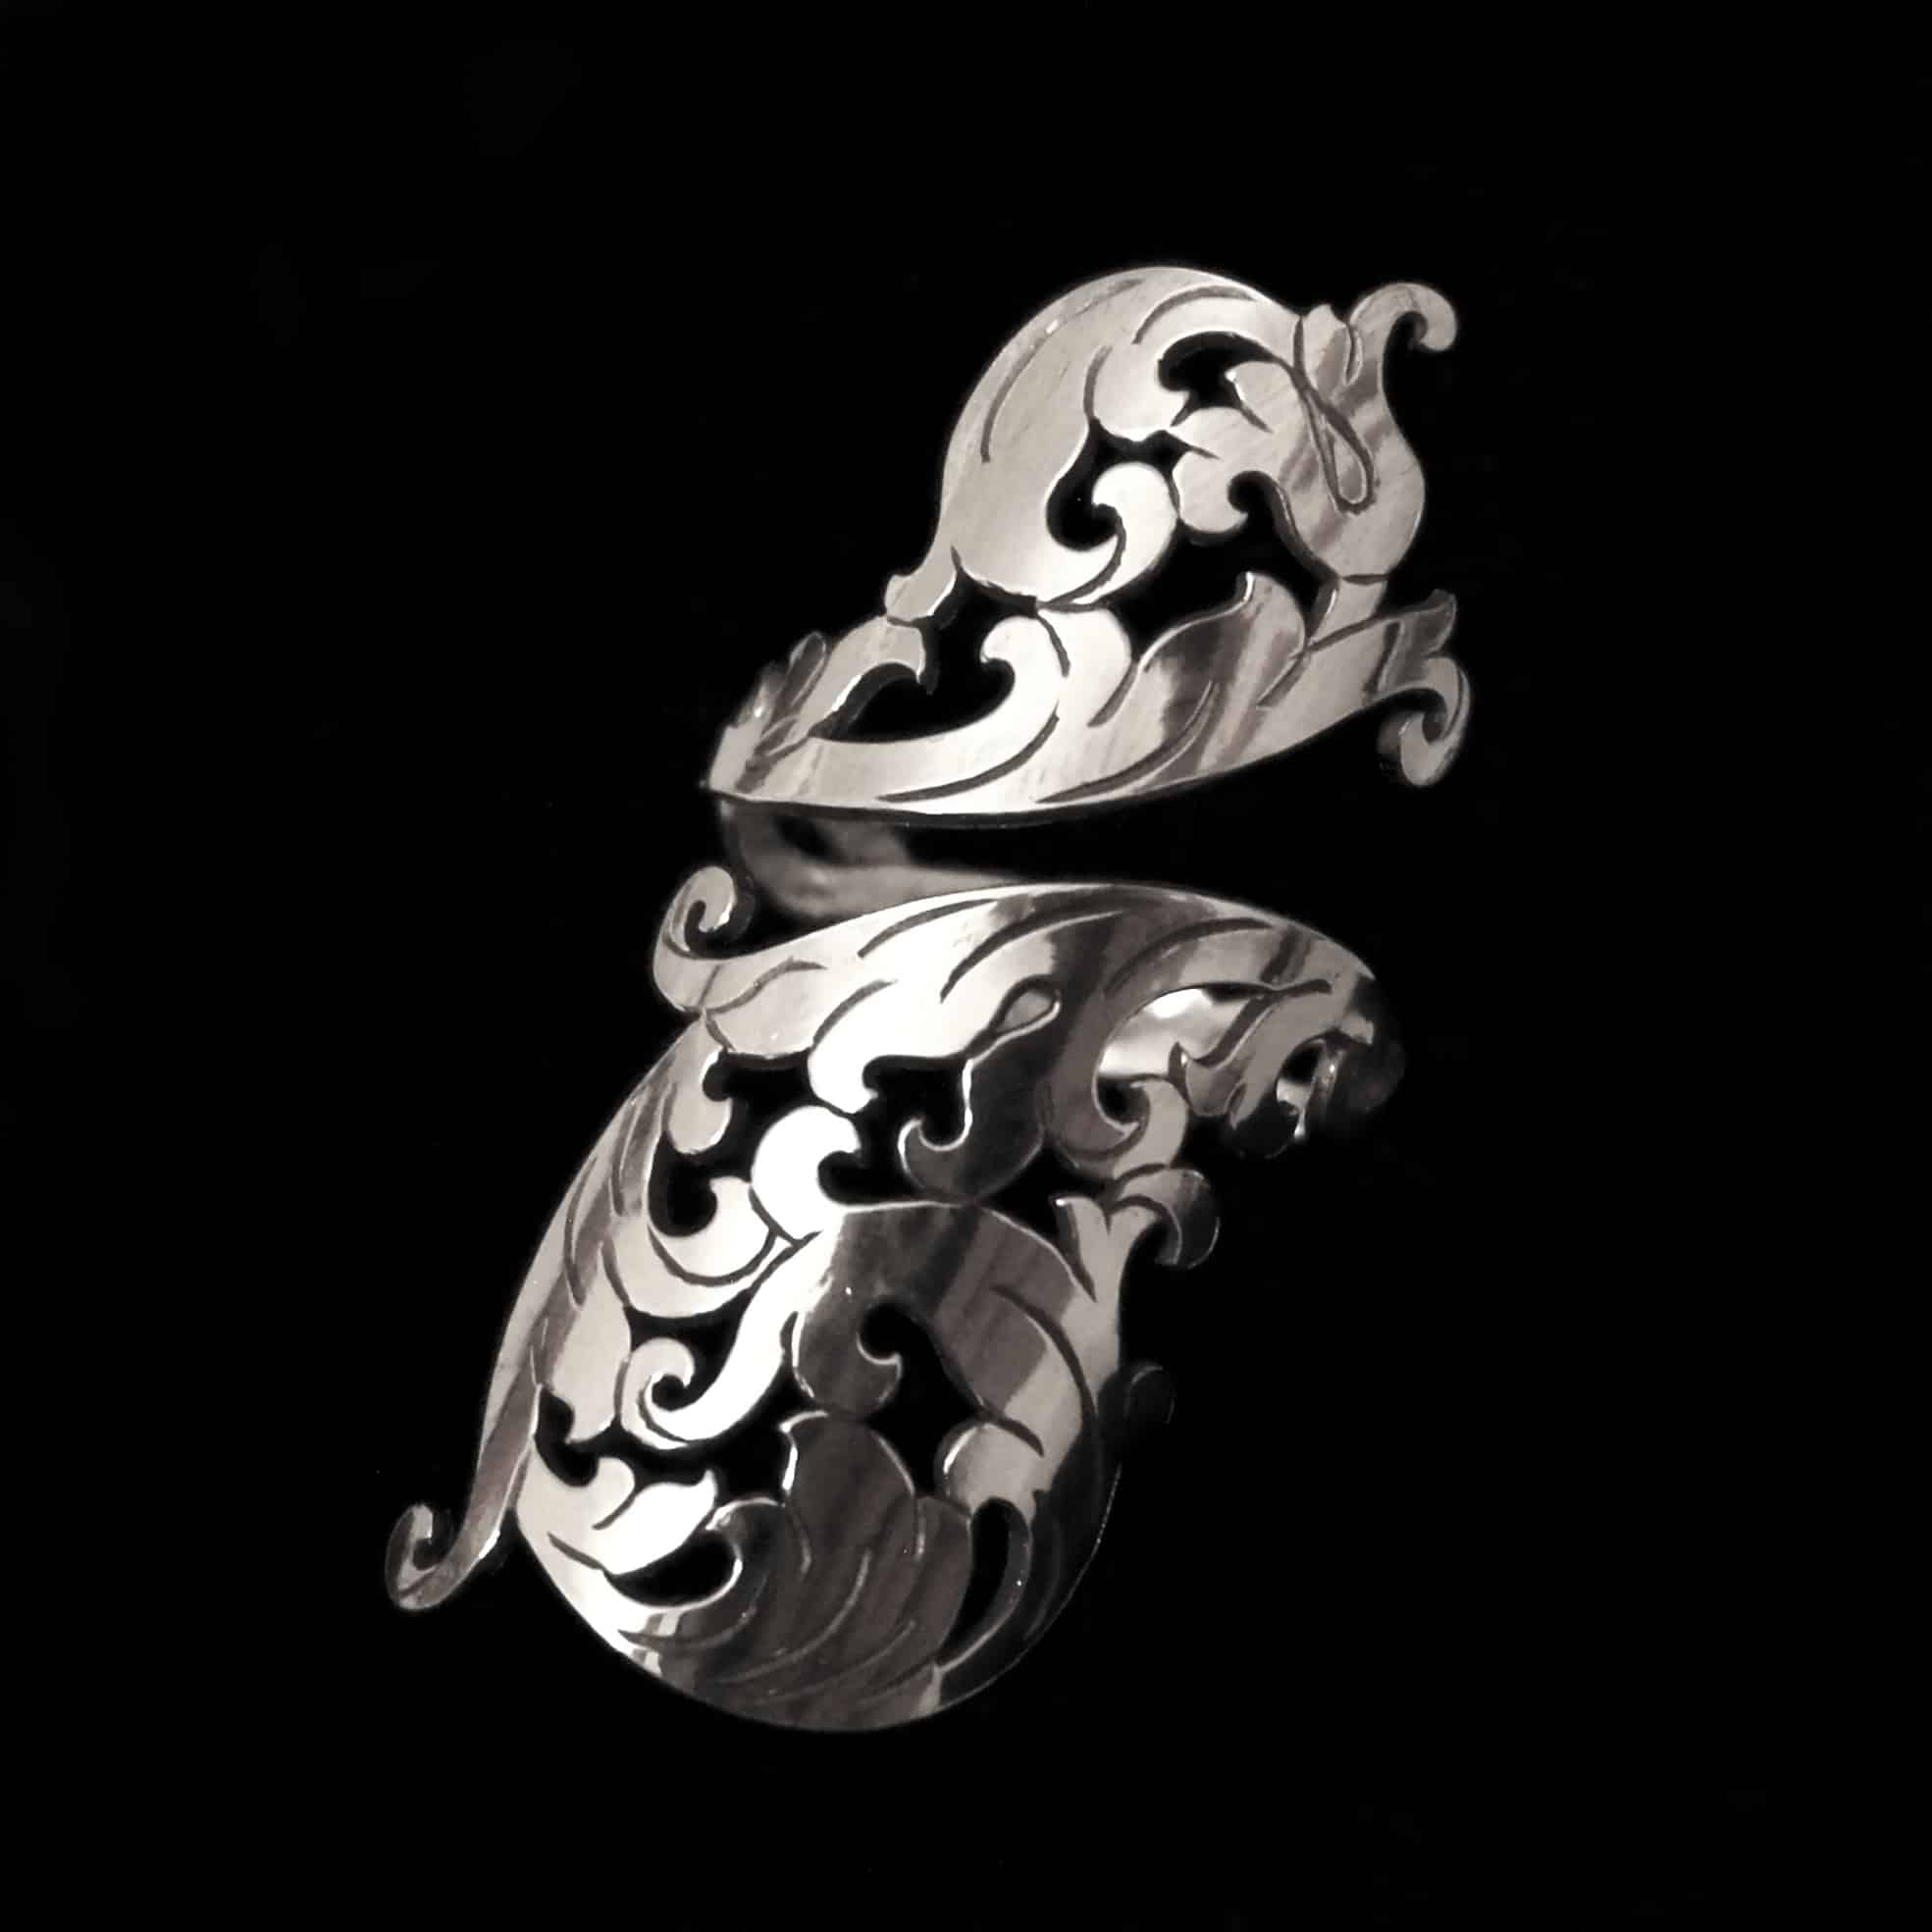 baroque-soiree-adjustable-silver-ring-by-skadi-jewellery-design